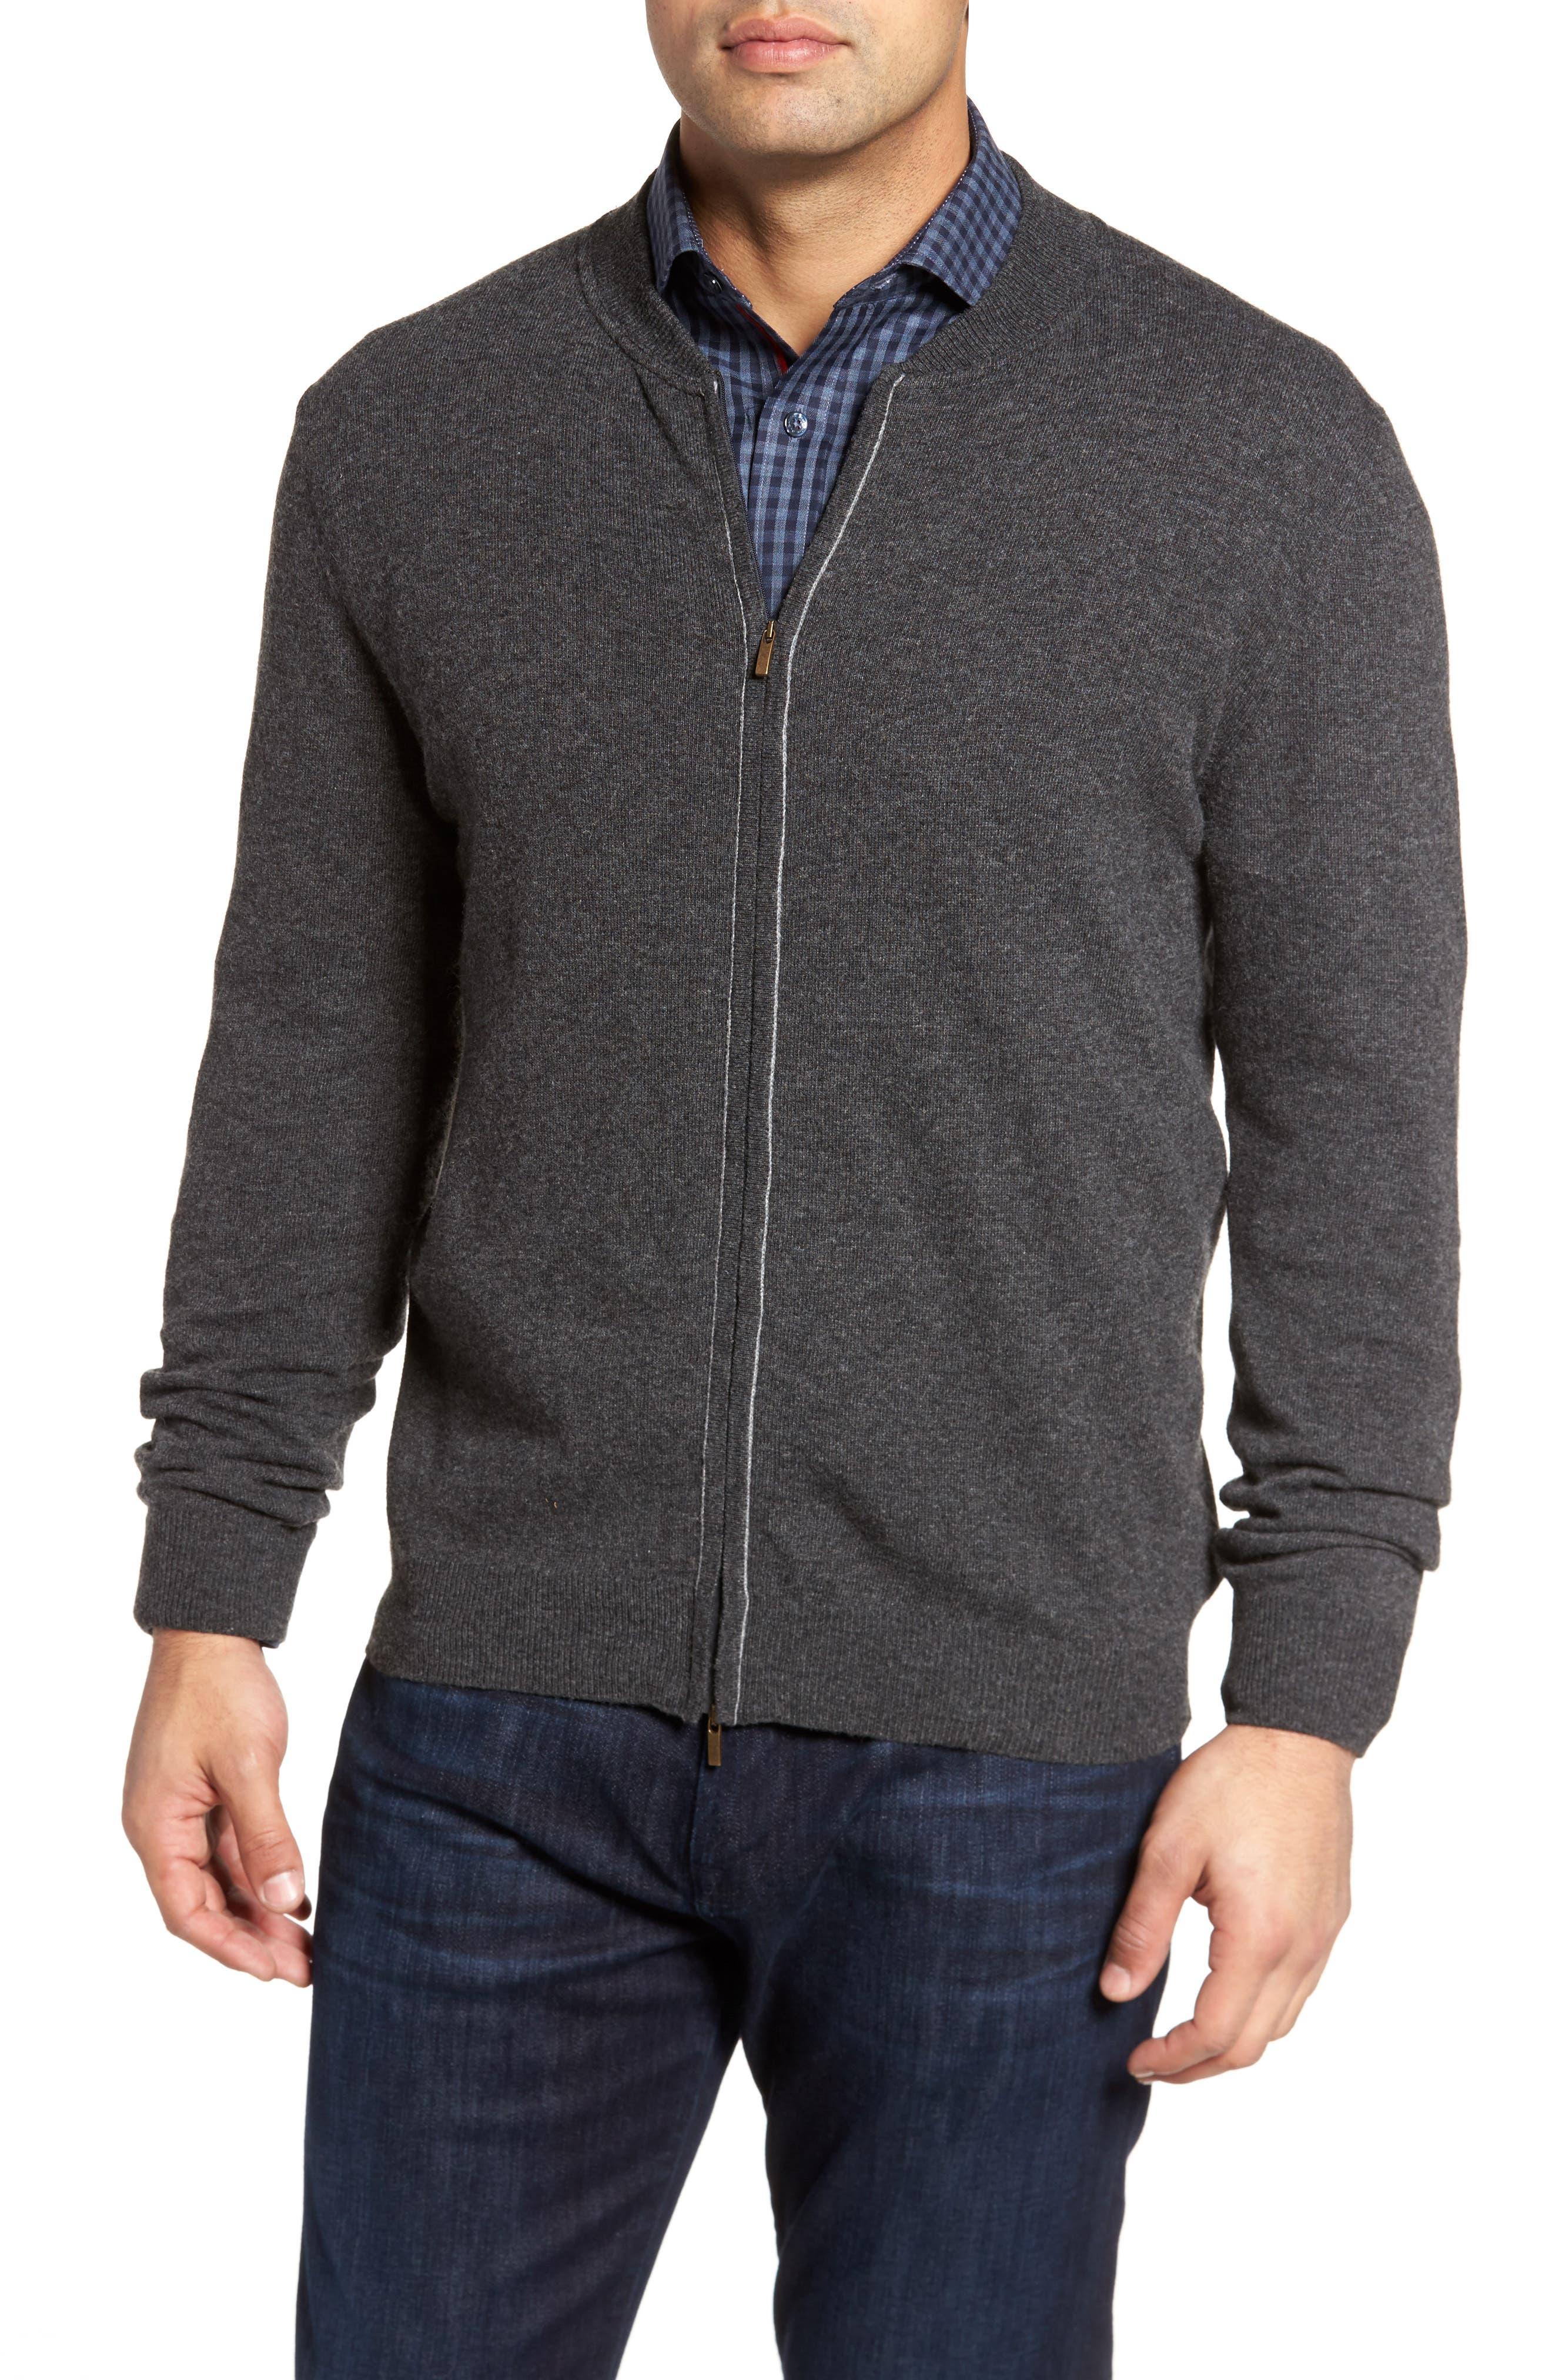 Zip Sweater,                             Main thumbnail 1, color,                             020